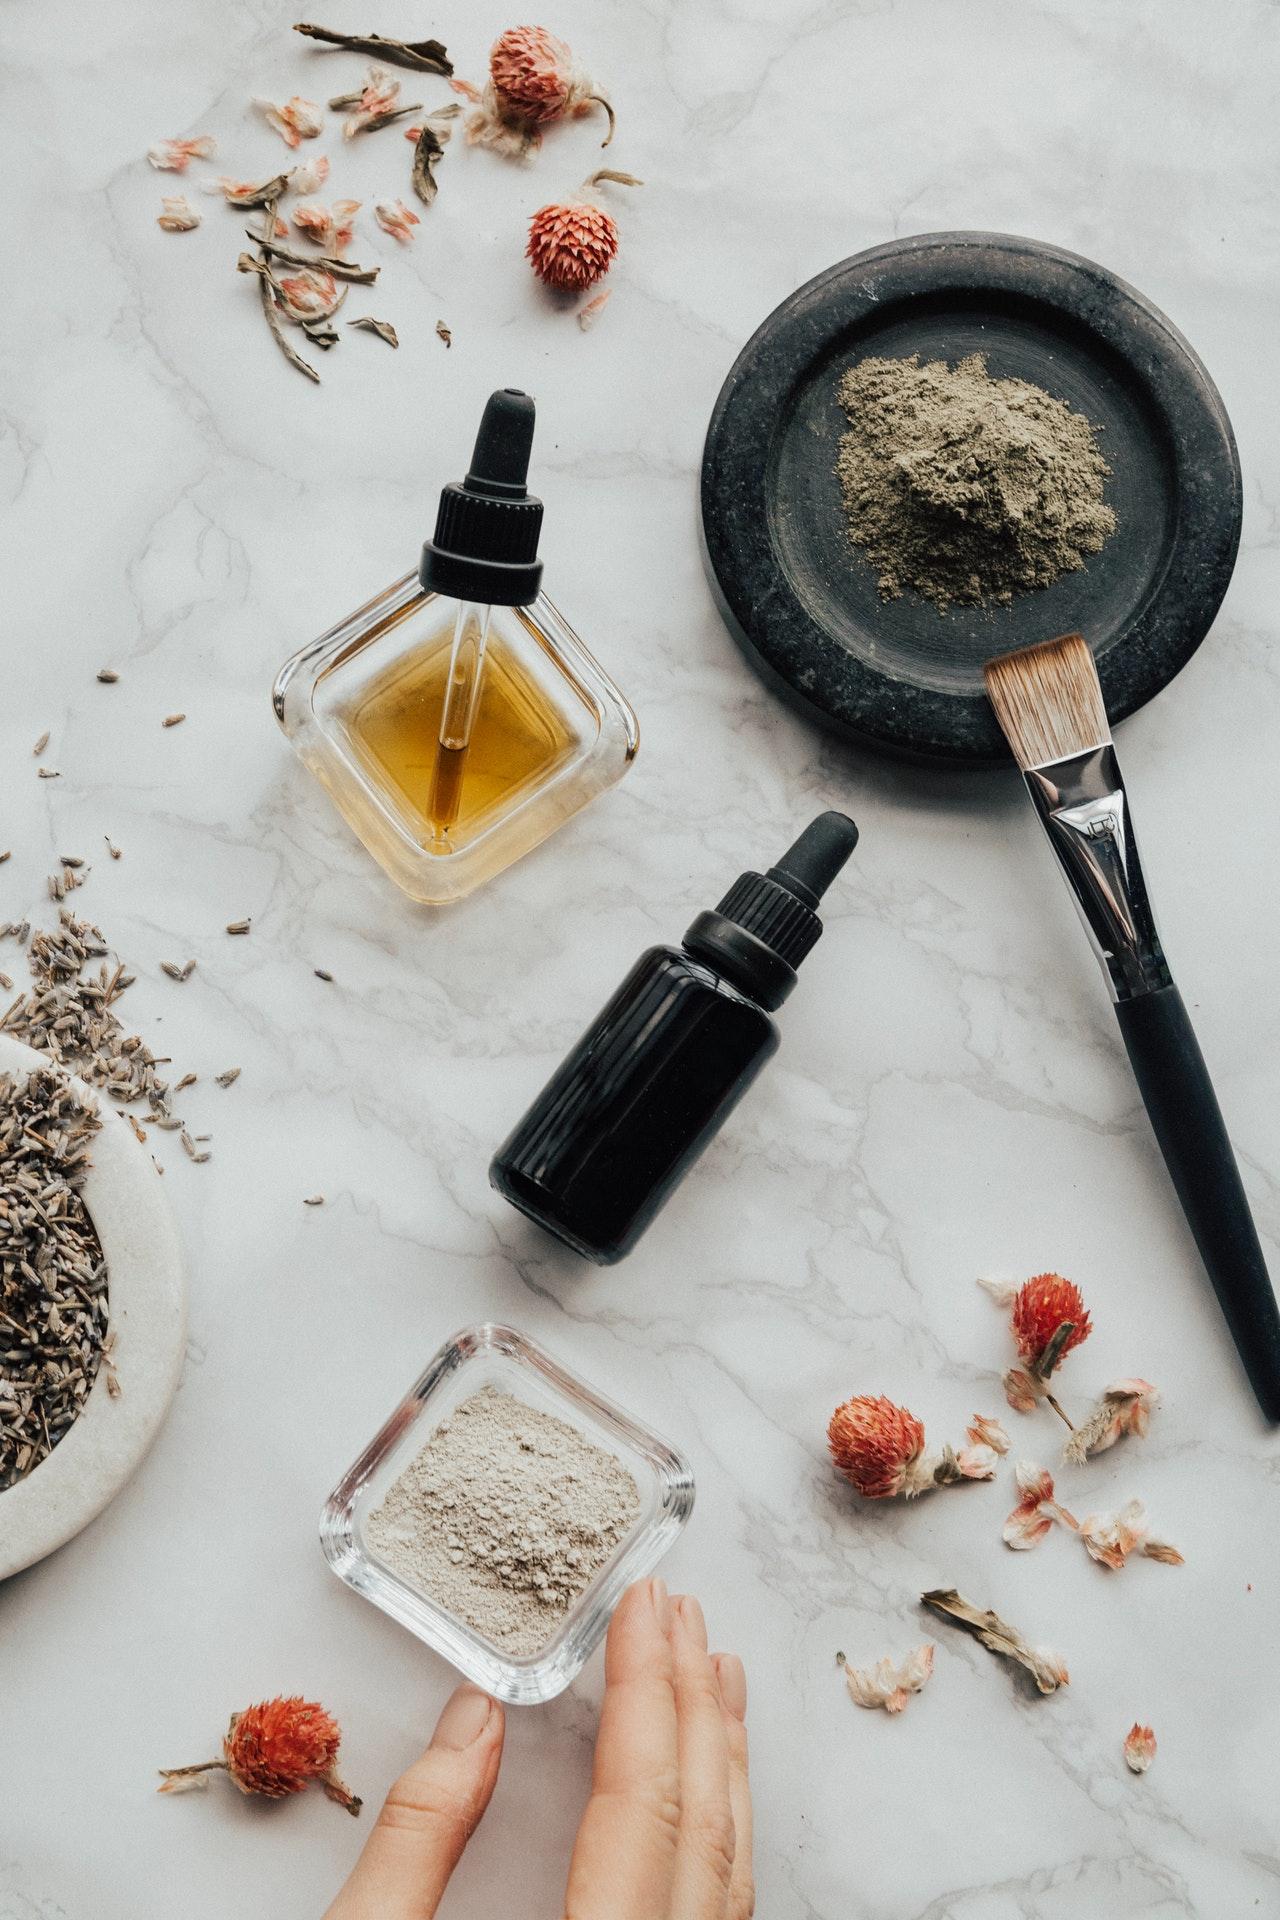 Hautpflege Produkte bei Chris Farrell Cosmetics